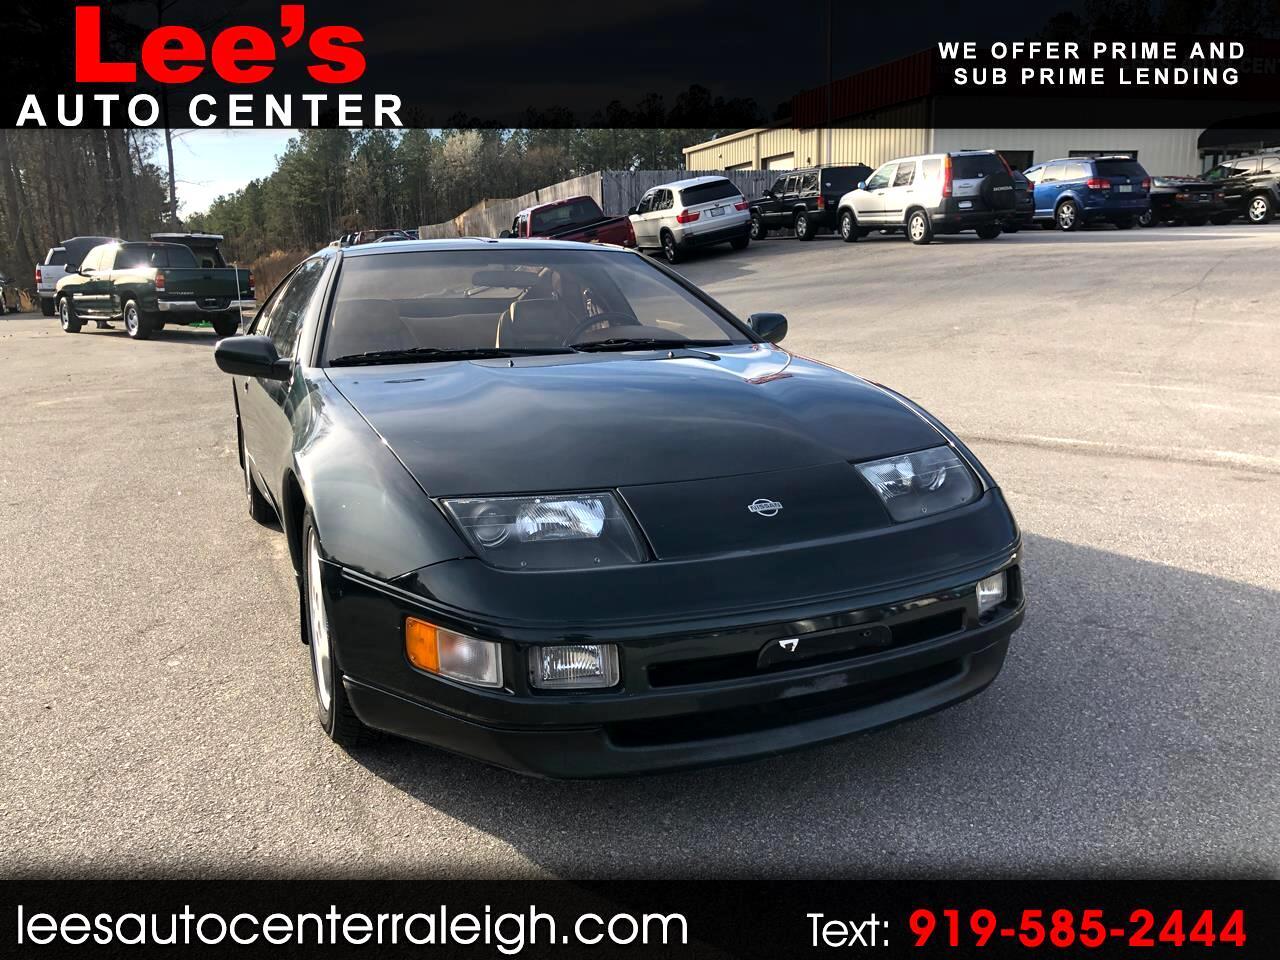 1994 Nissan 300ZX 2+2